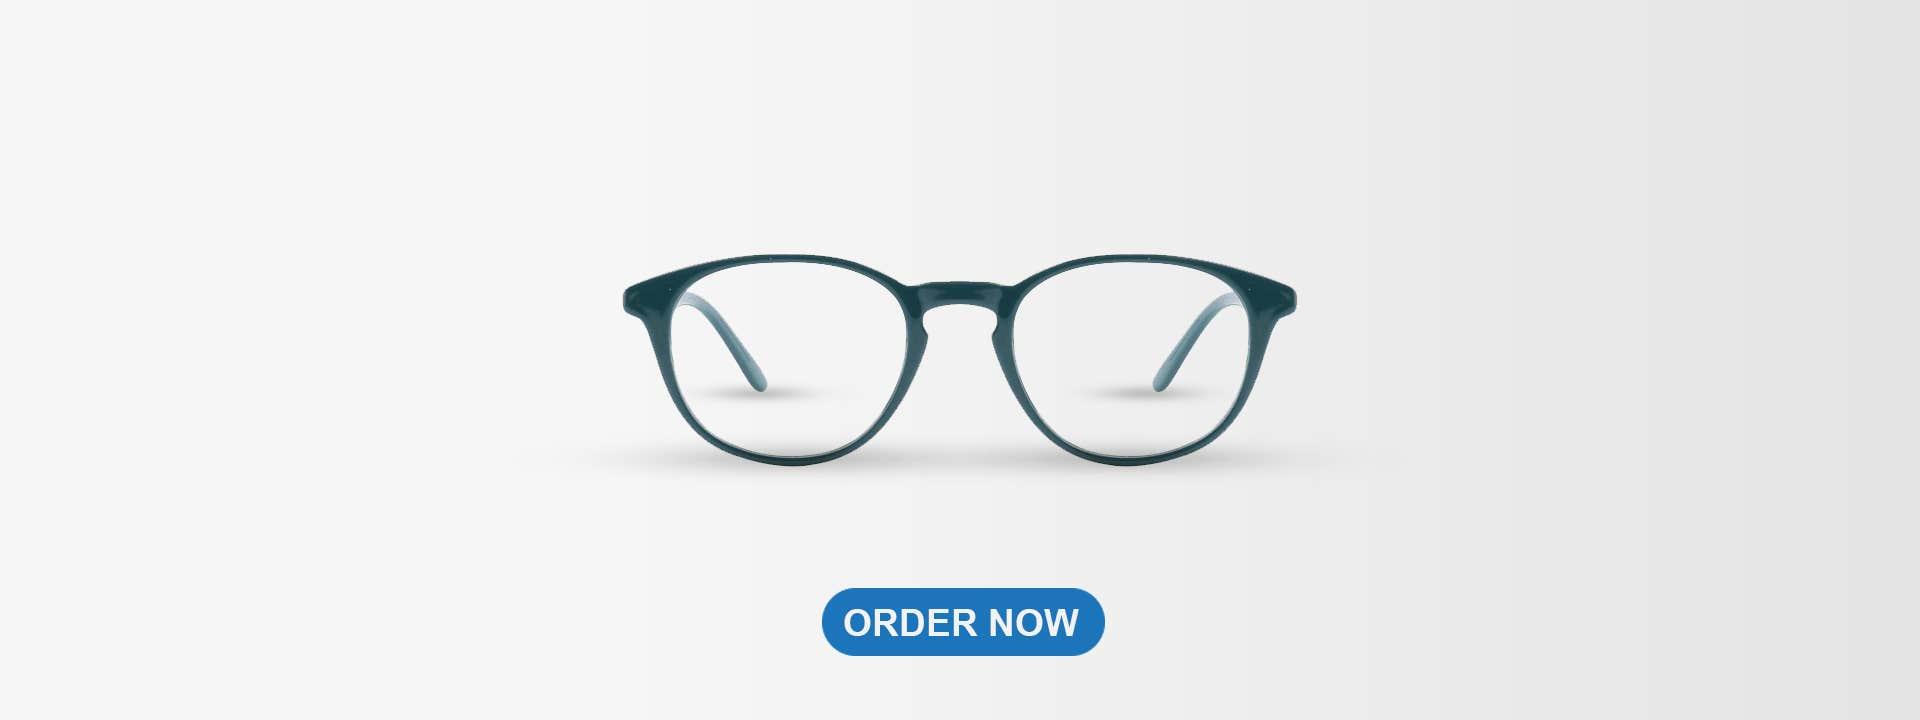 Buy 126100 Rectangle Eyeglasses